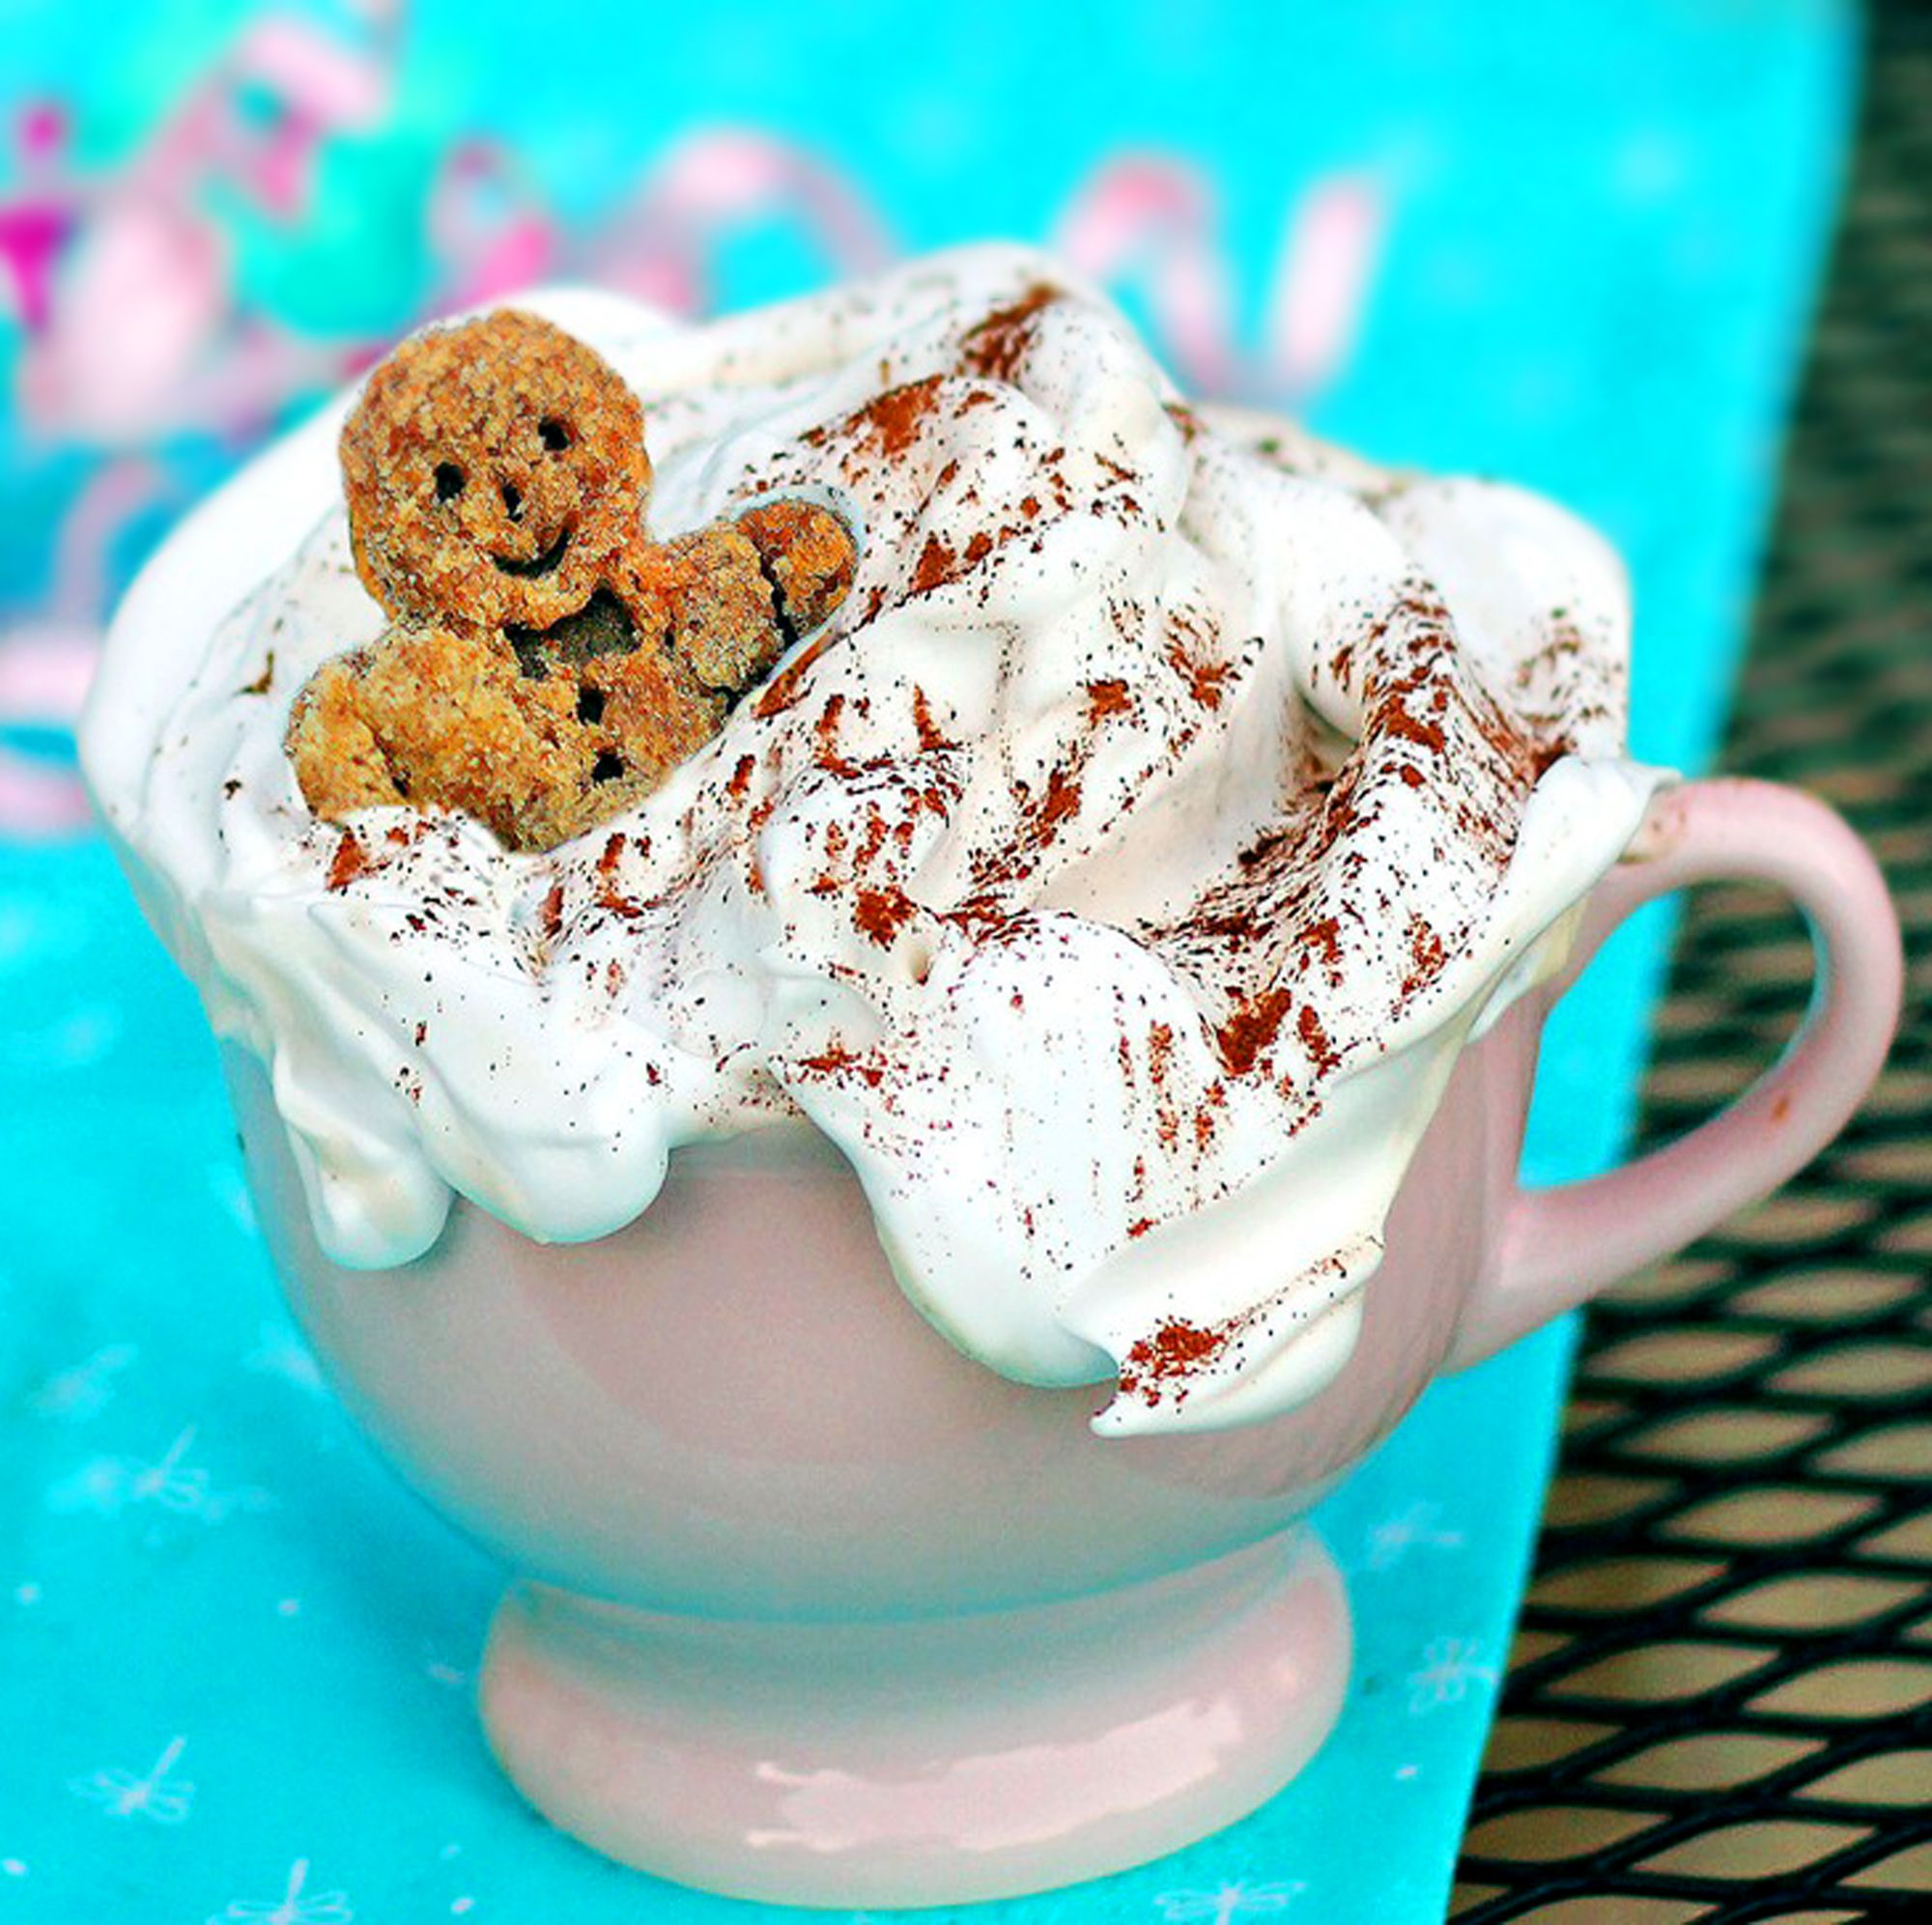 Starbucks Copycat Recipe: Gingerbread Spice Latte